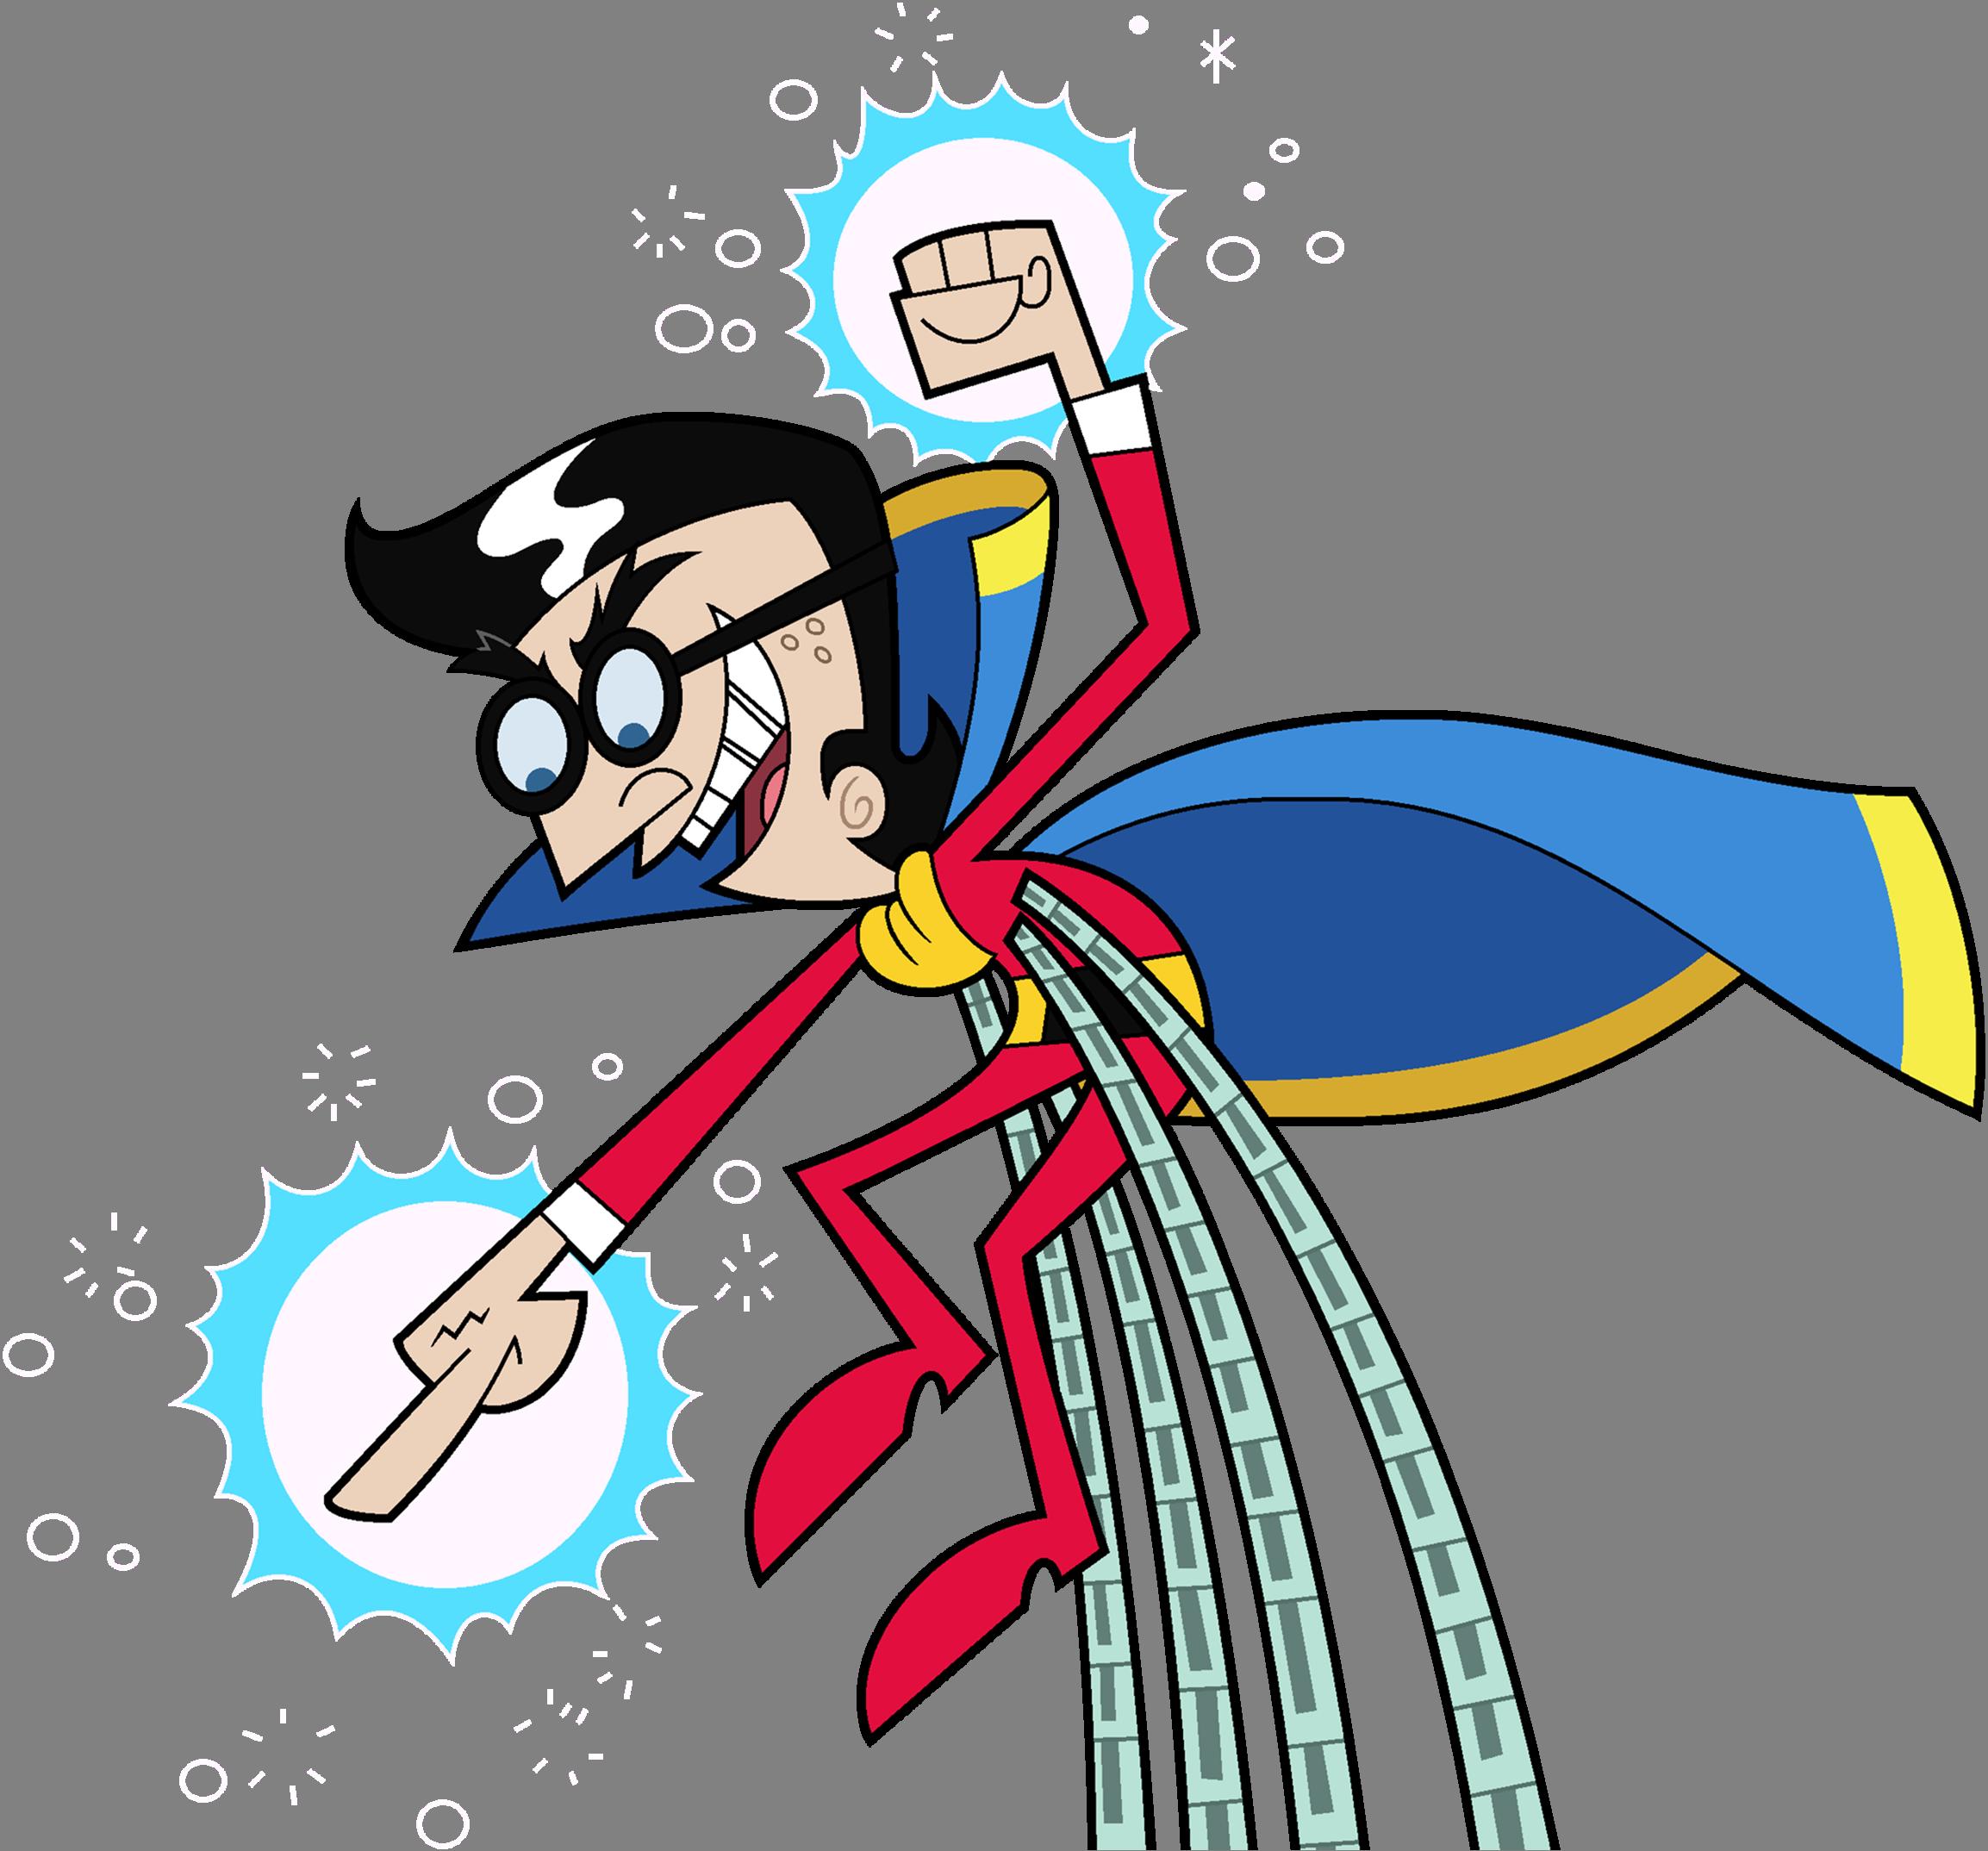 Doctor Crocktopus